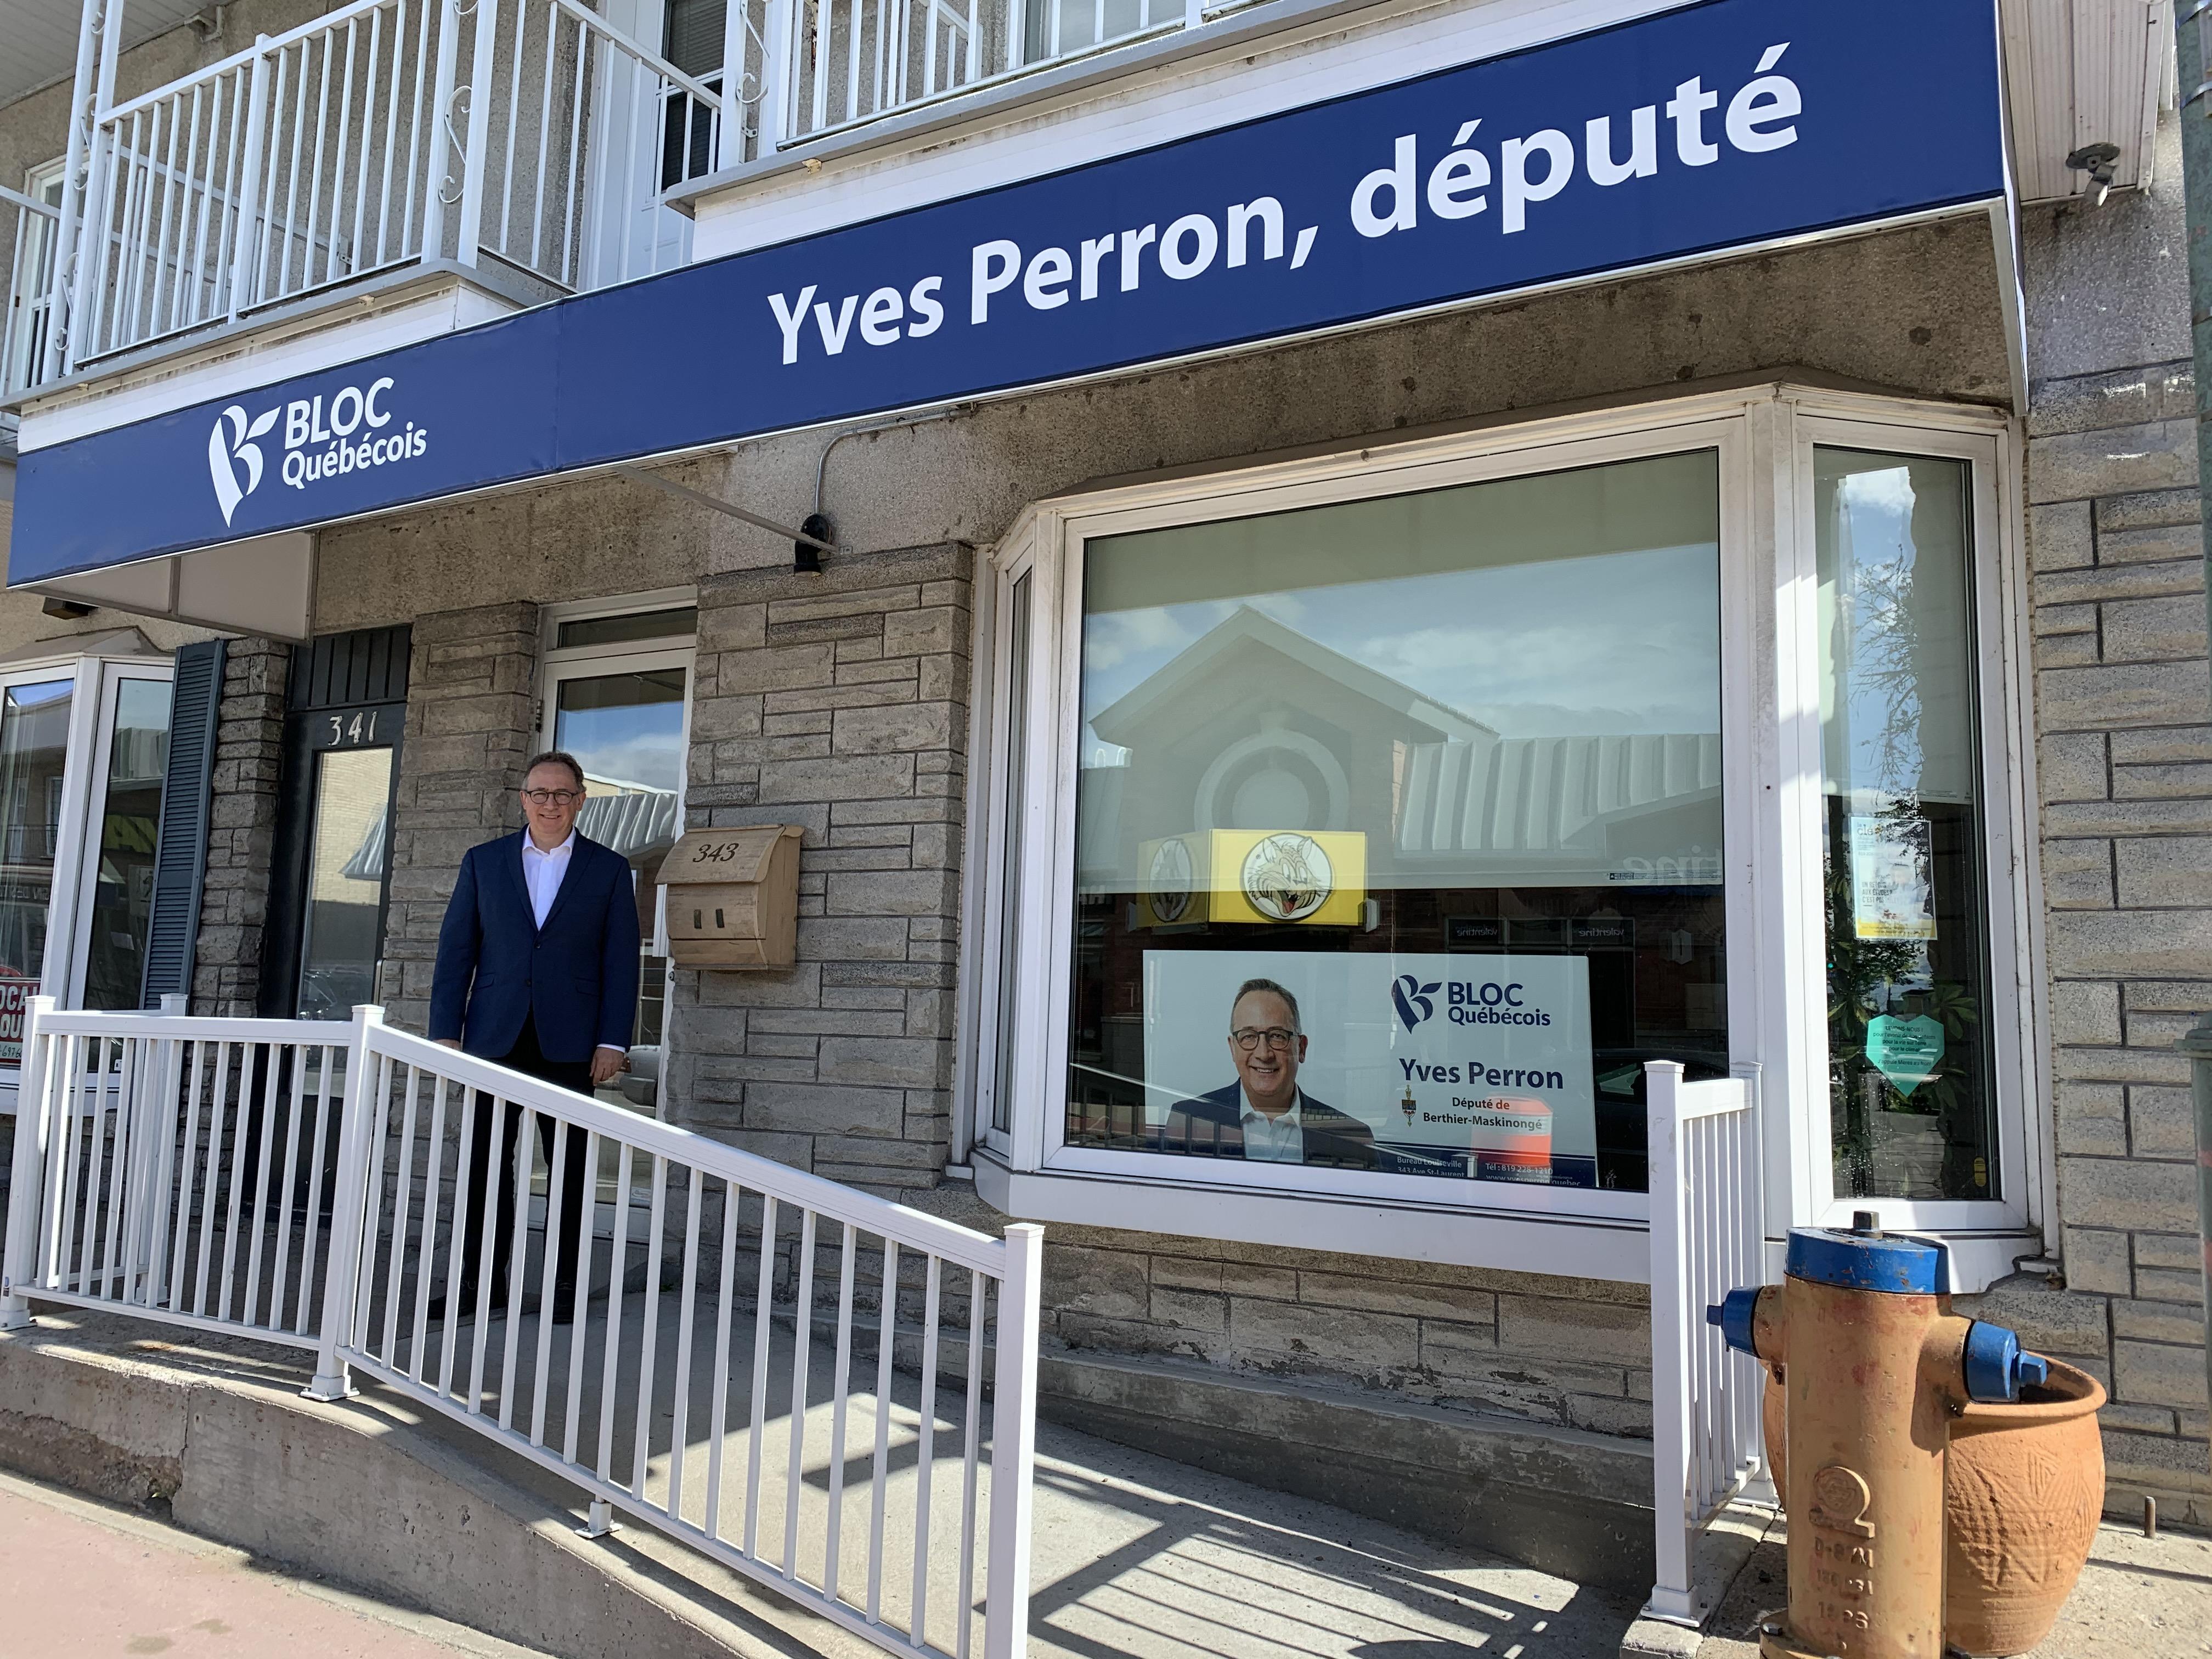 bureau Yves Perron